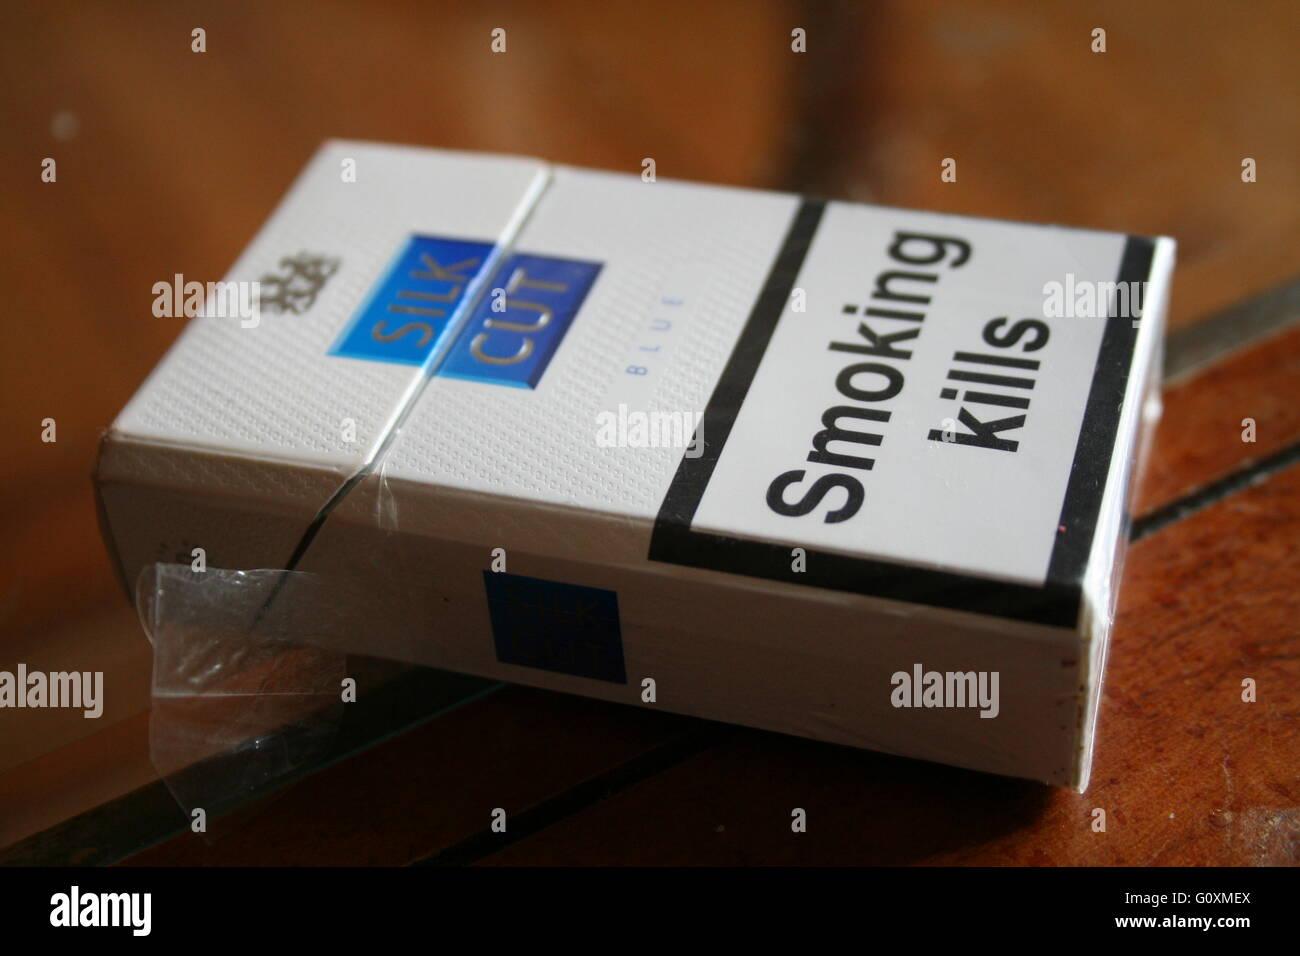 Gauloises cigarettes USA shipping